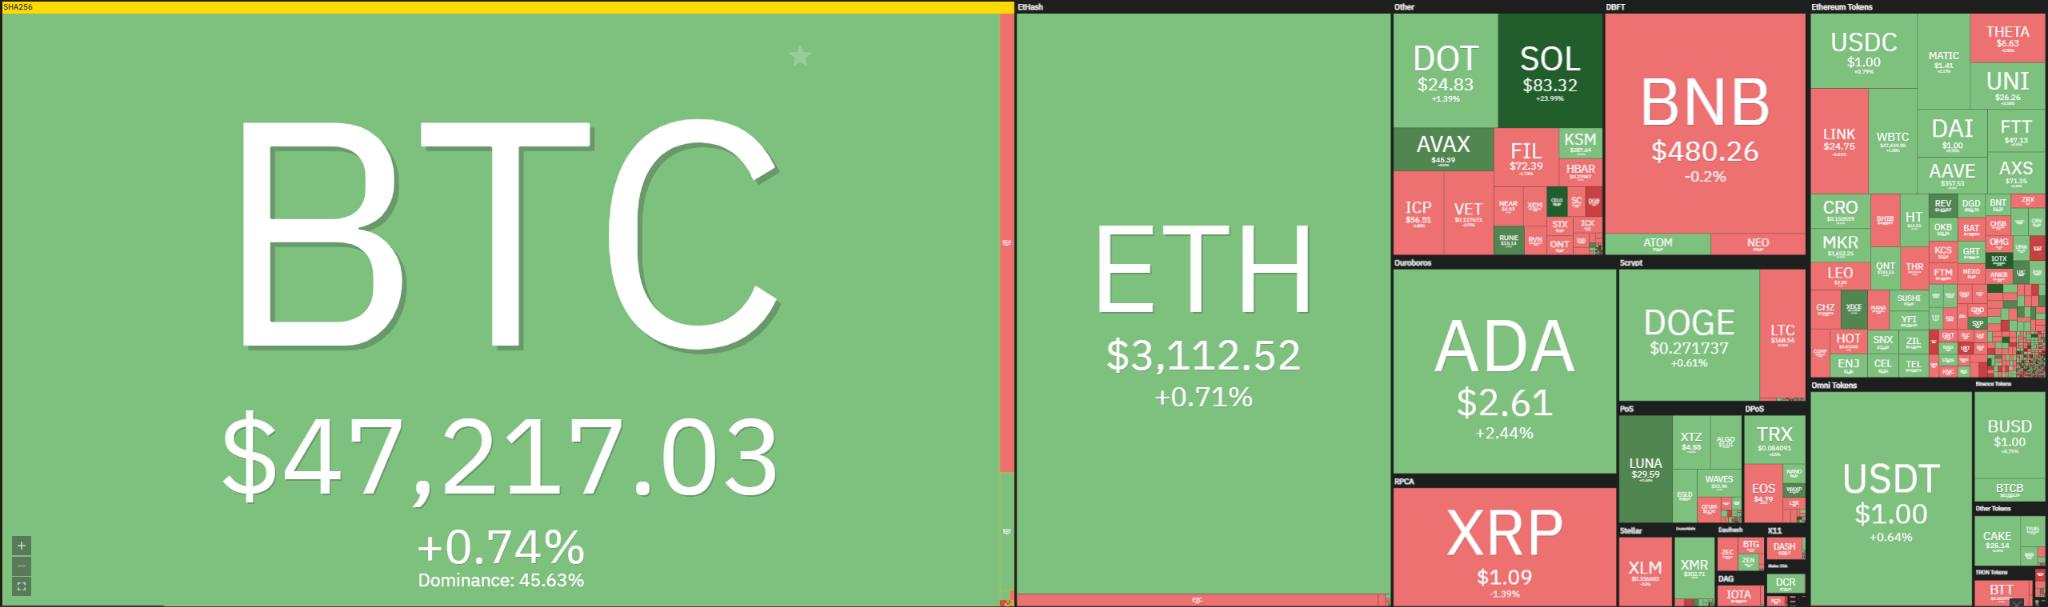 Litecoin Price Analysis: LTC retraces back to $165, set to slowly reverse today? 1